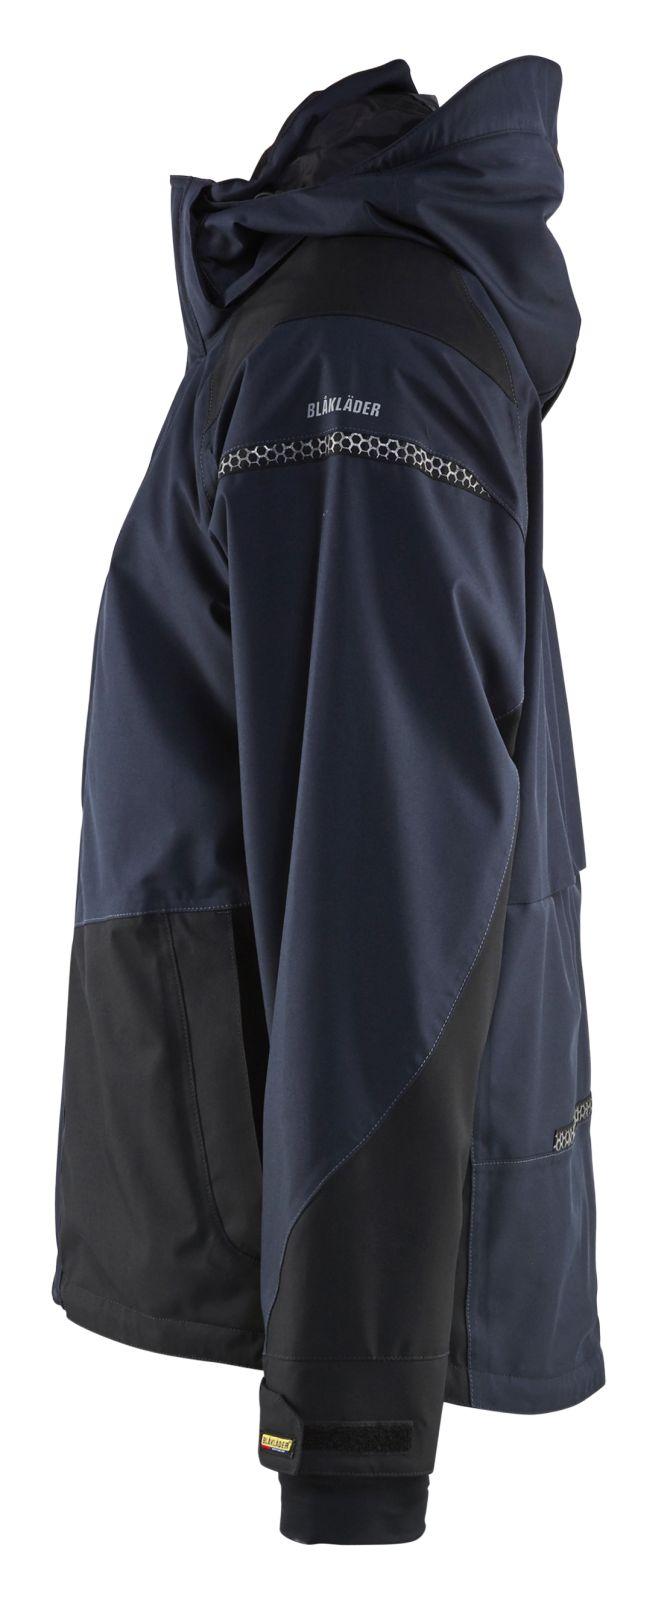 Blaklader Regenjacks 49881987 Stretch donker marineblauw-zwart(8699)